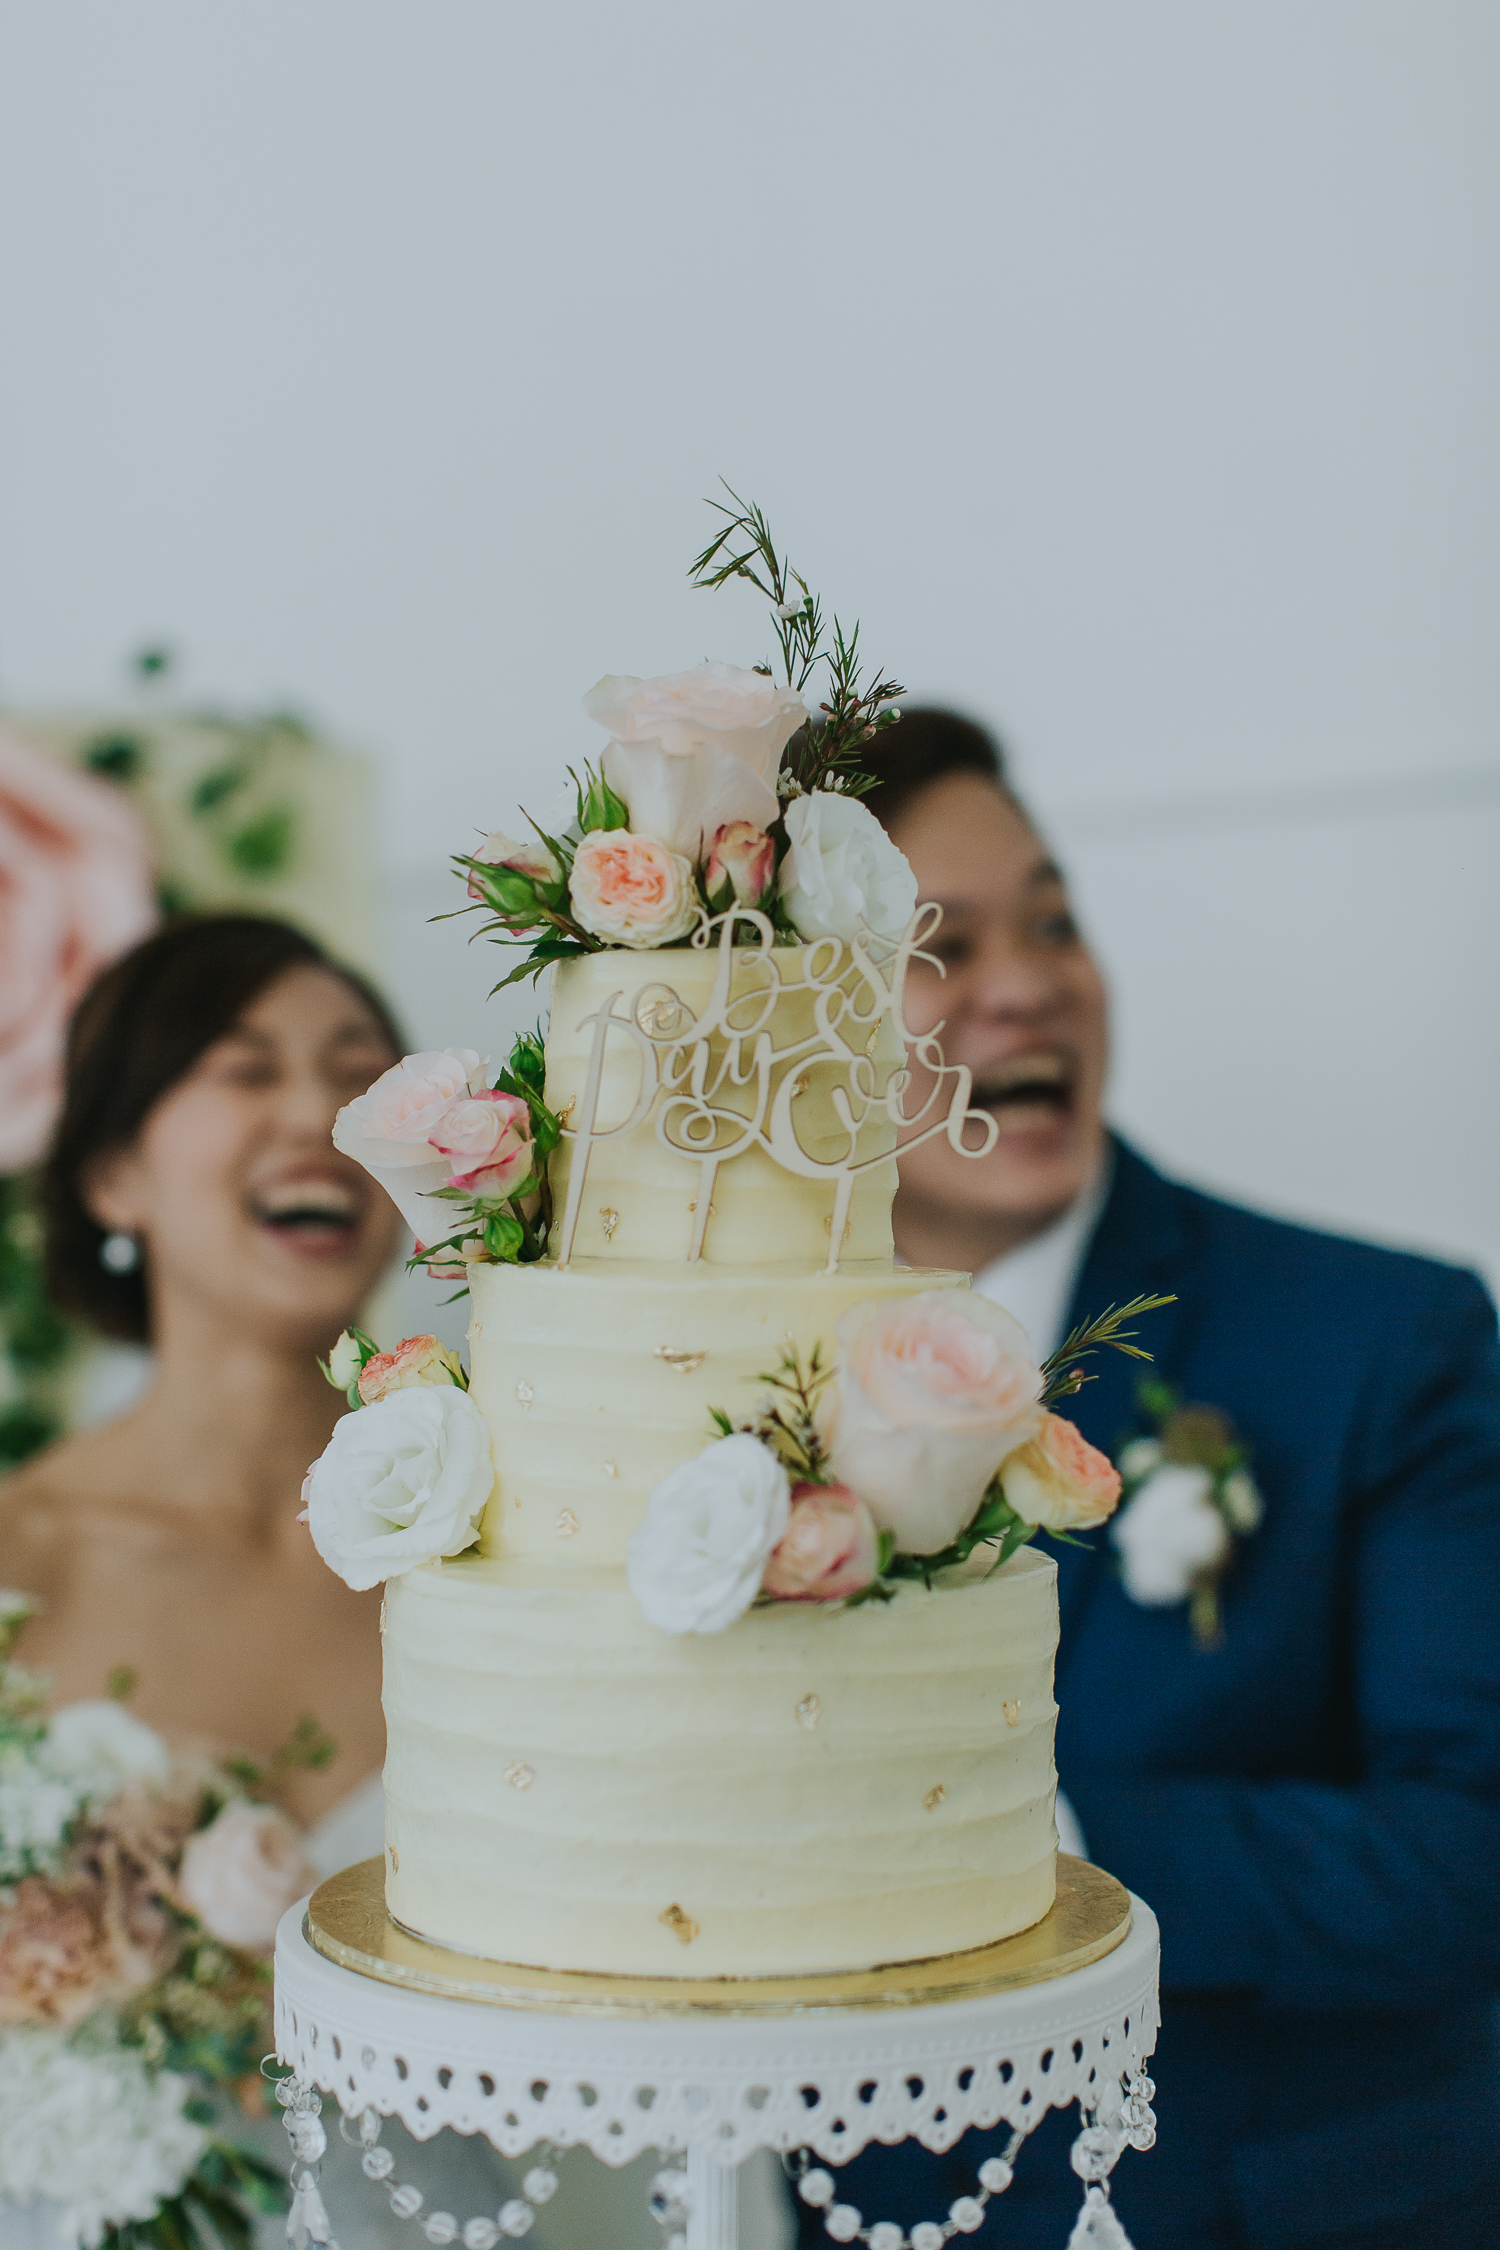 Singapore+Actual+Day+Wedding+Photographer+Grand+Mercure+Oliver+Estelle-0061.jpg